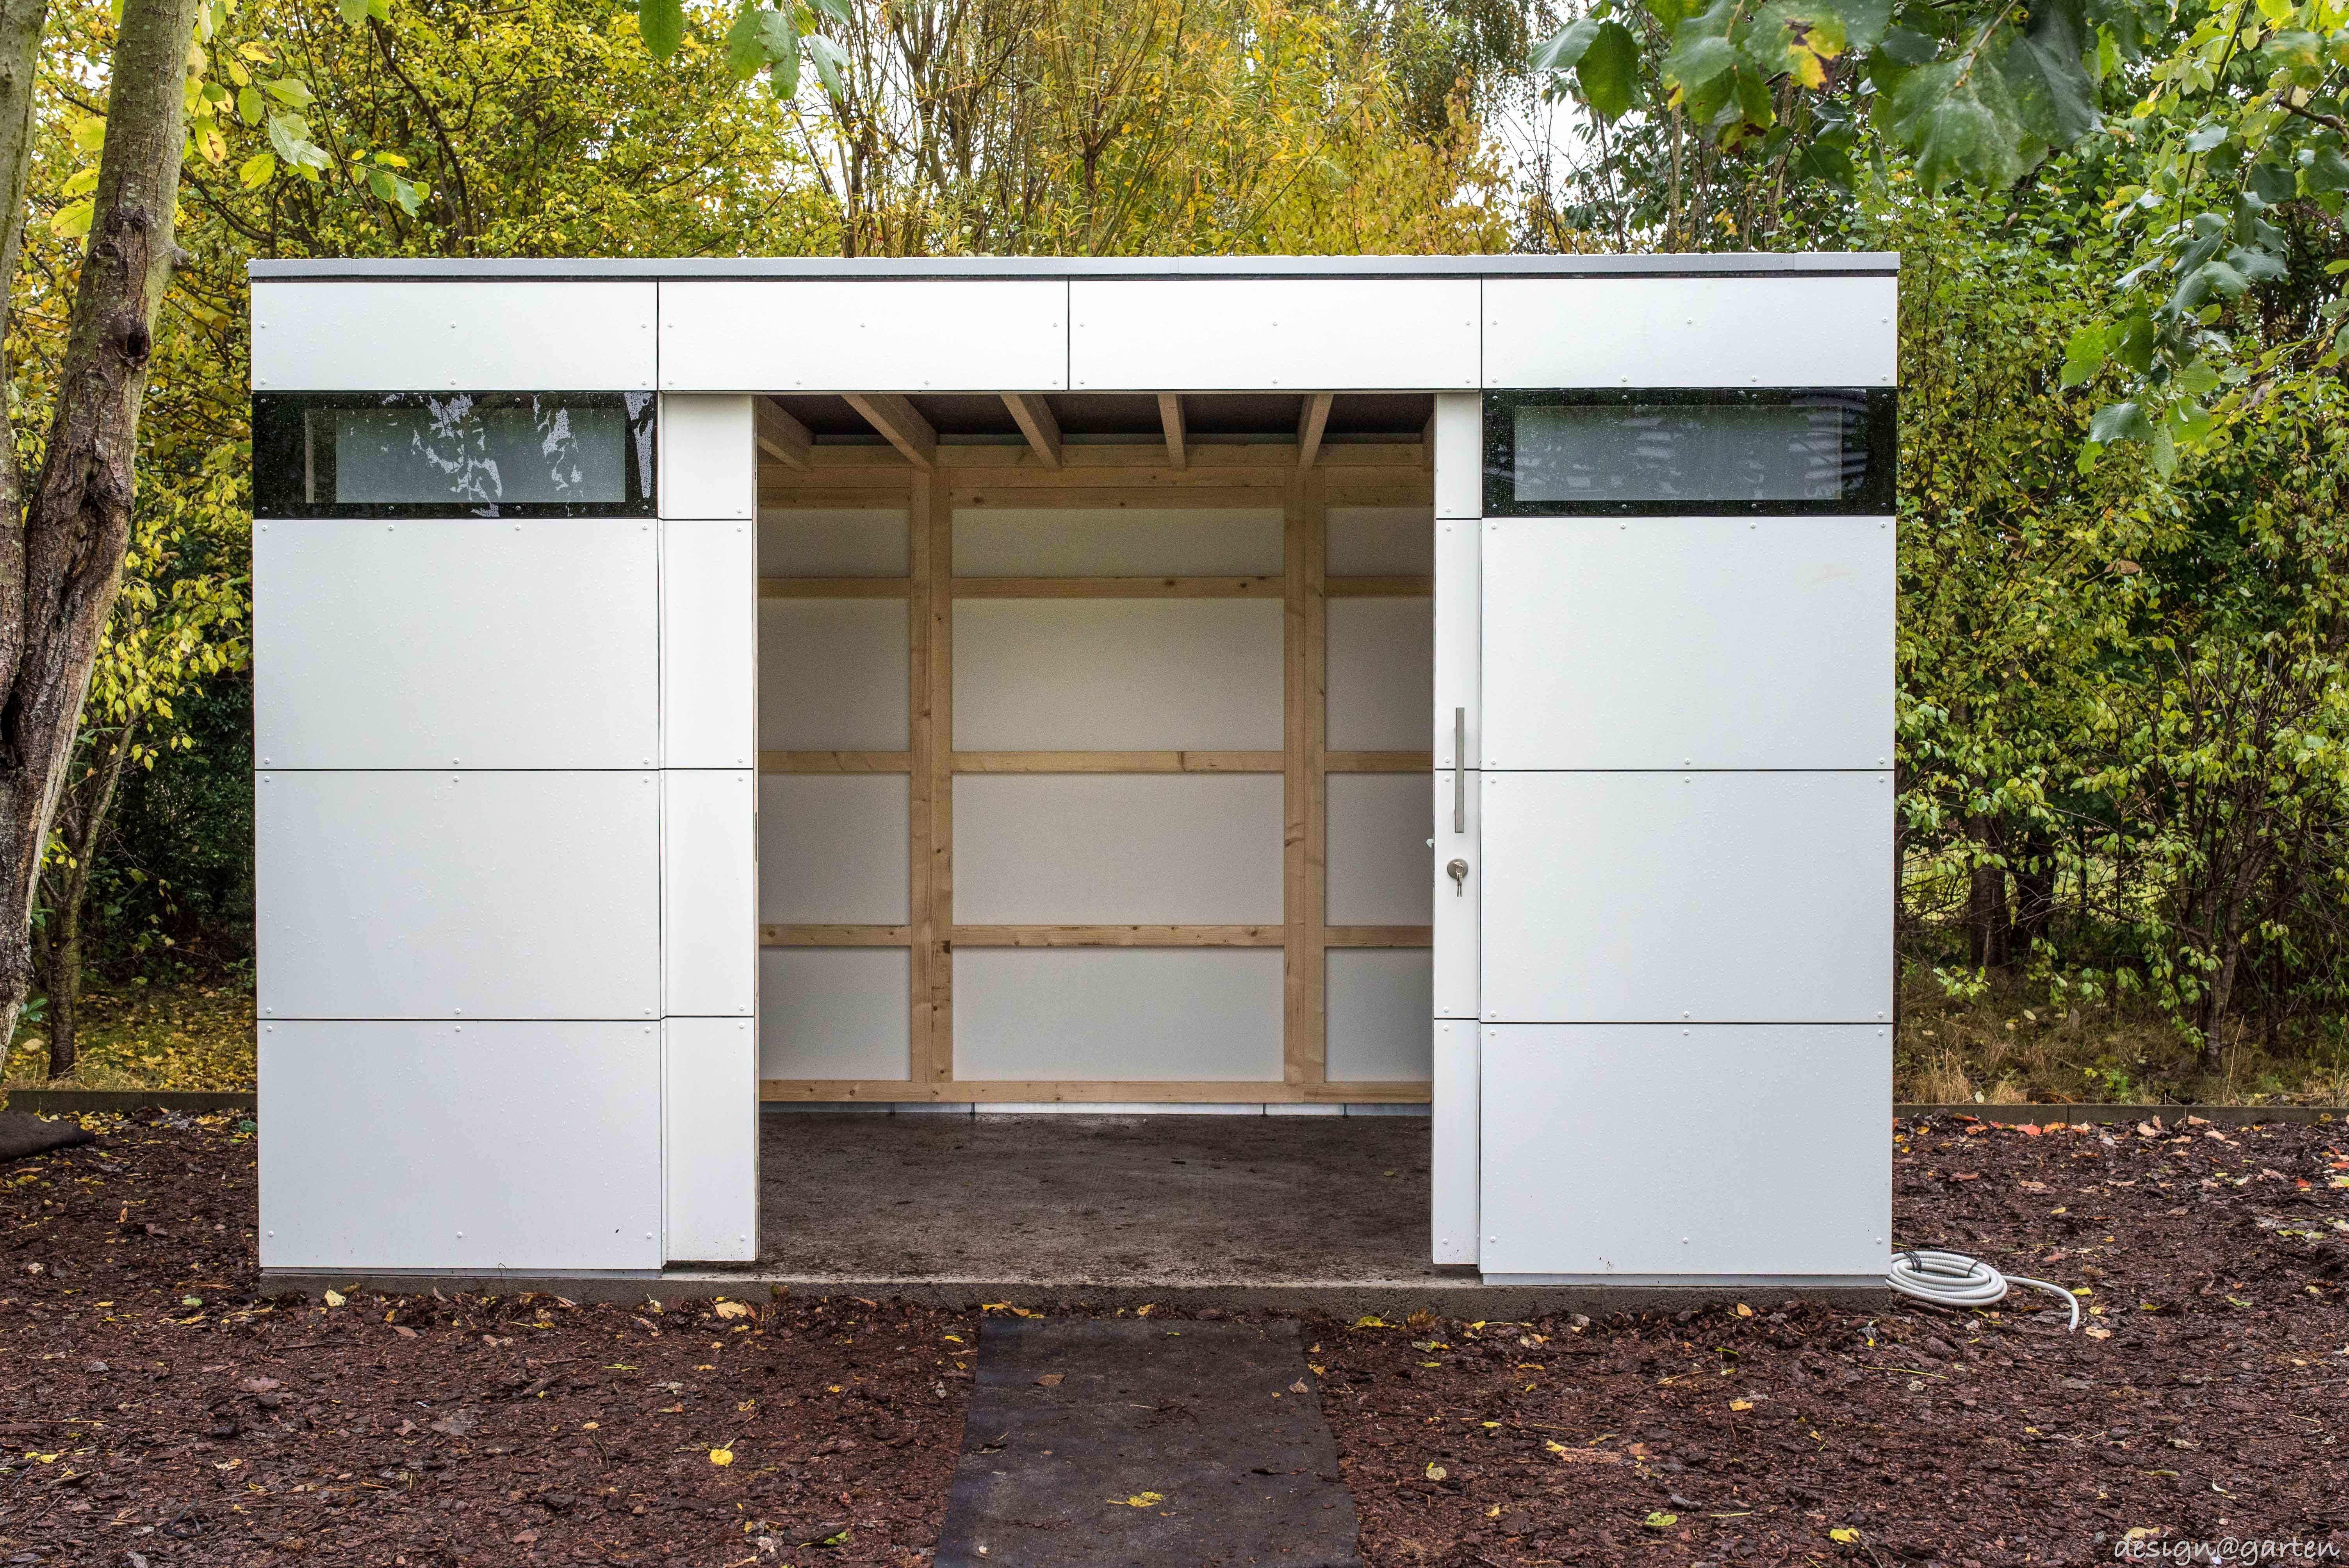 Garten Rostock design gartenhaus gart in rostock by design garten augsburg